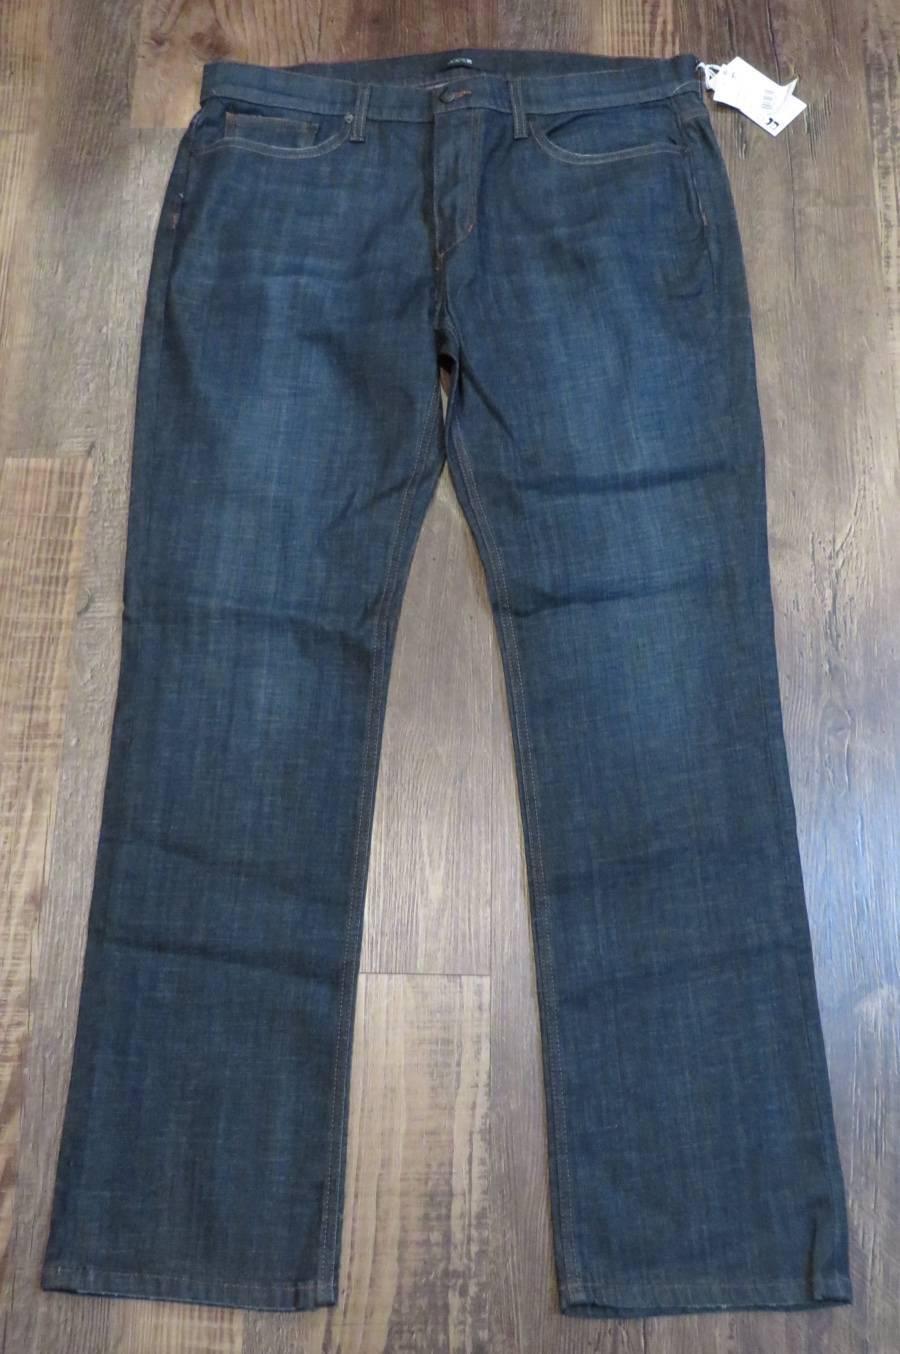 Joe's Jeans The Classic Straight Leg